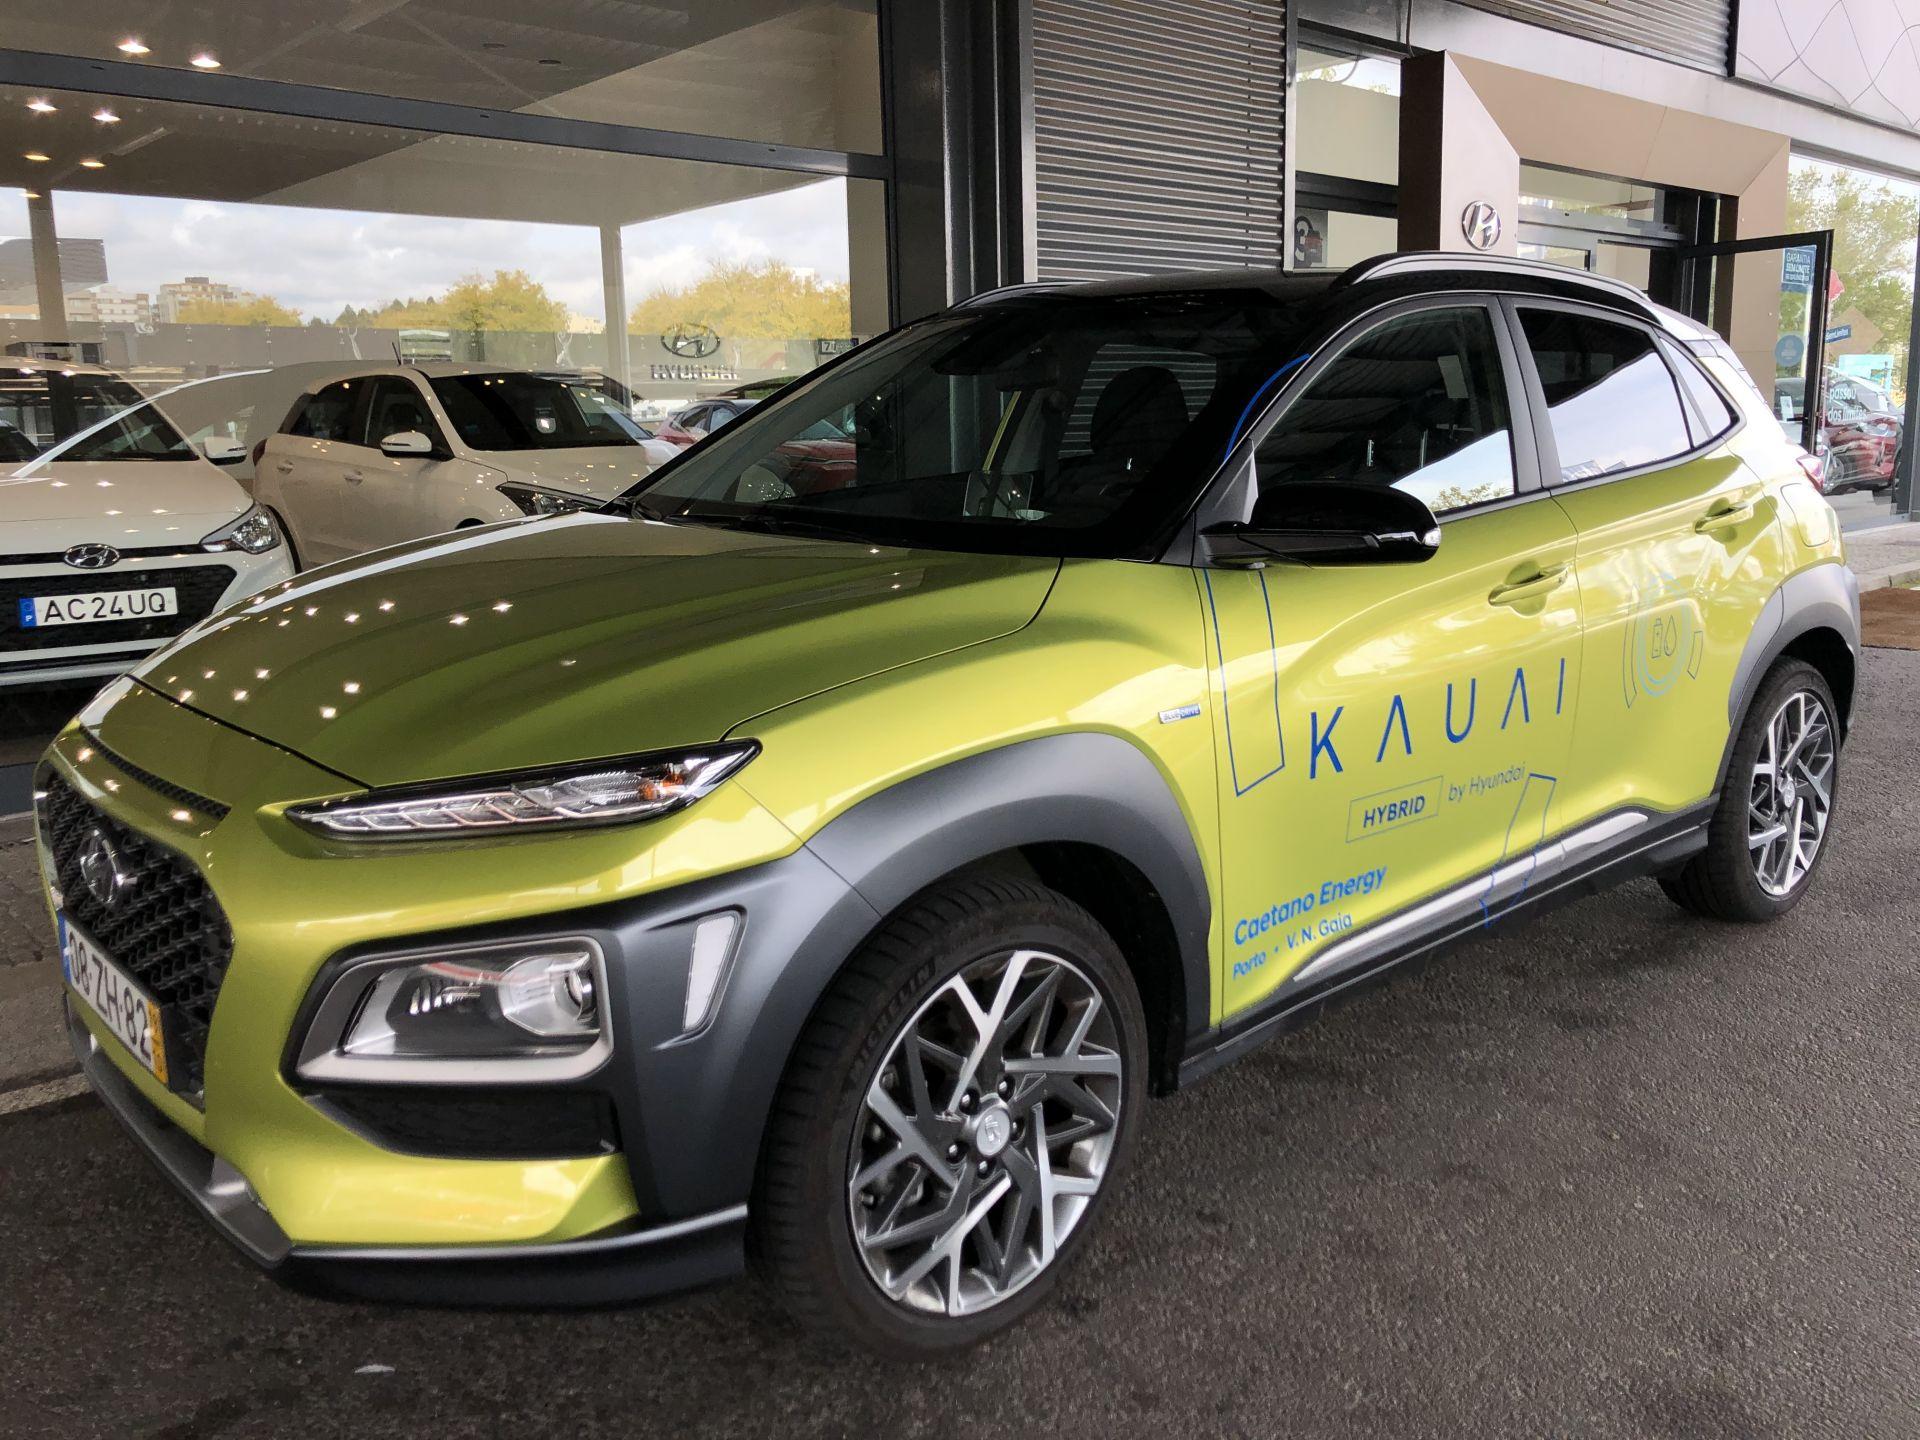 Hyundai Kauai HEV 1.6 GDi Premium MY20 + Navi + Vision  segunda mão Porto